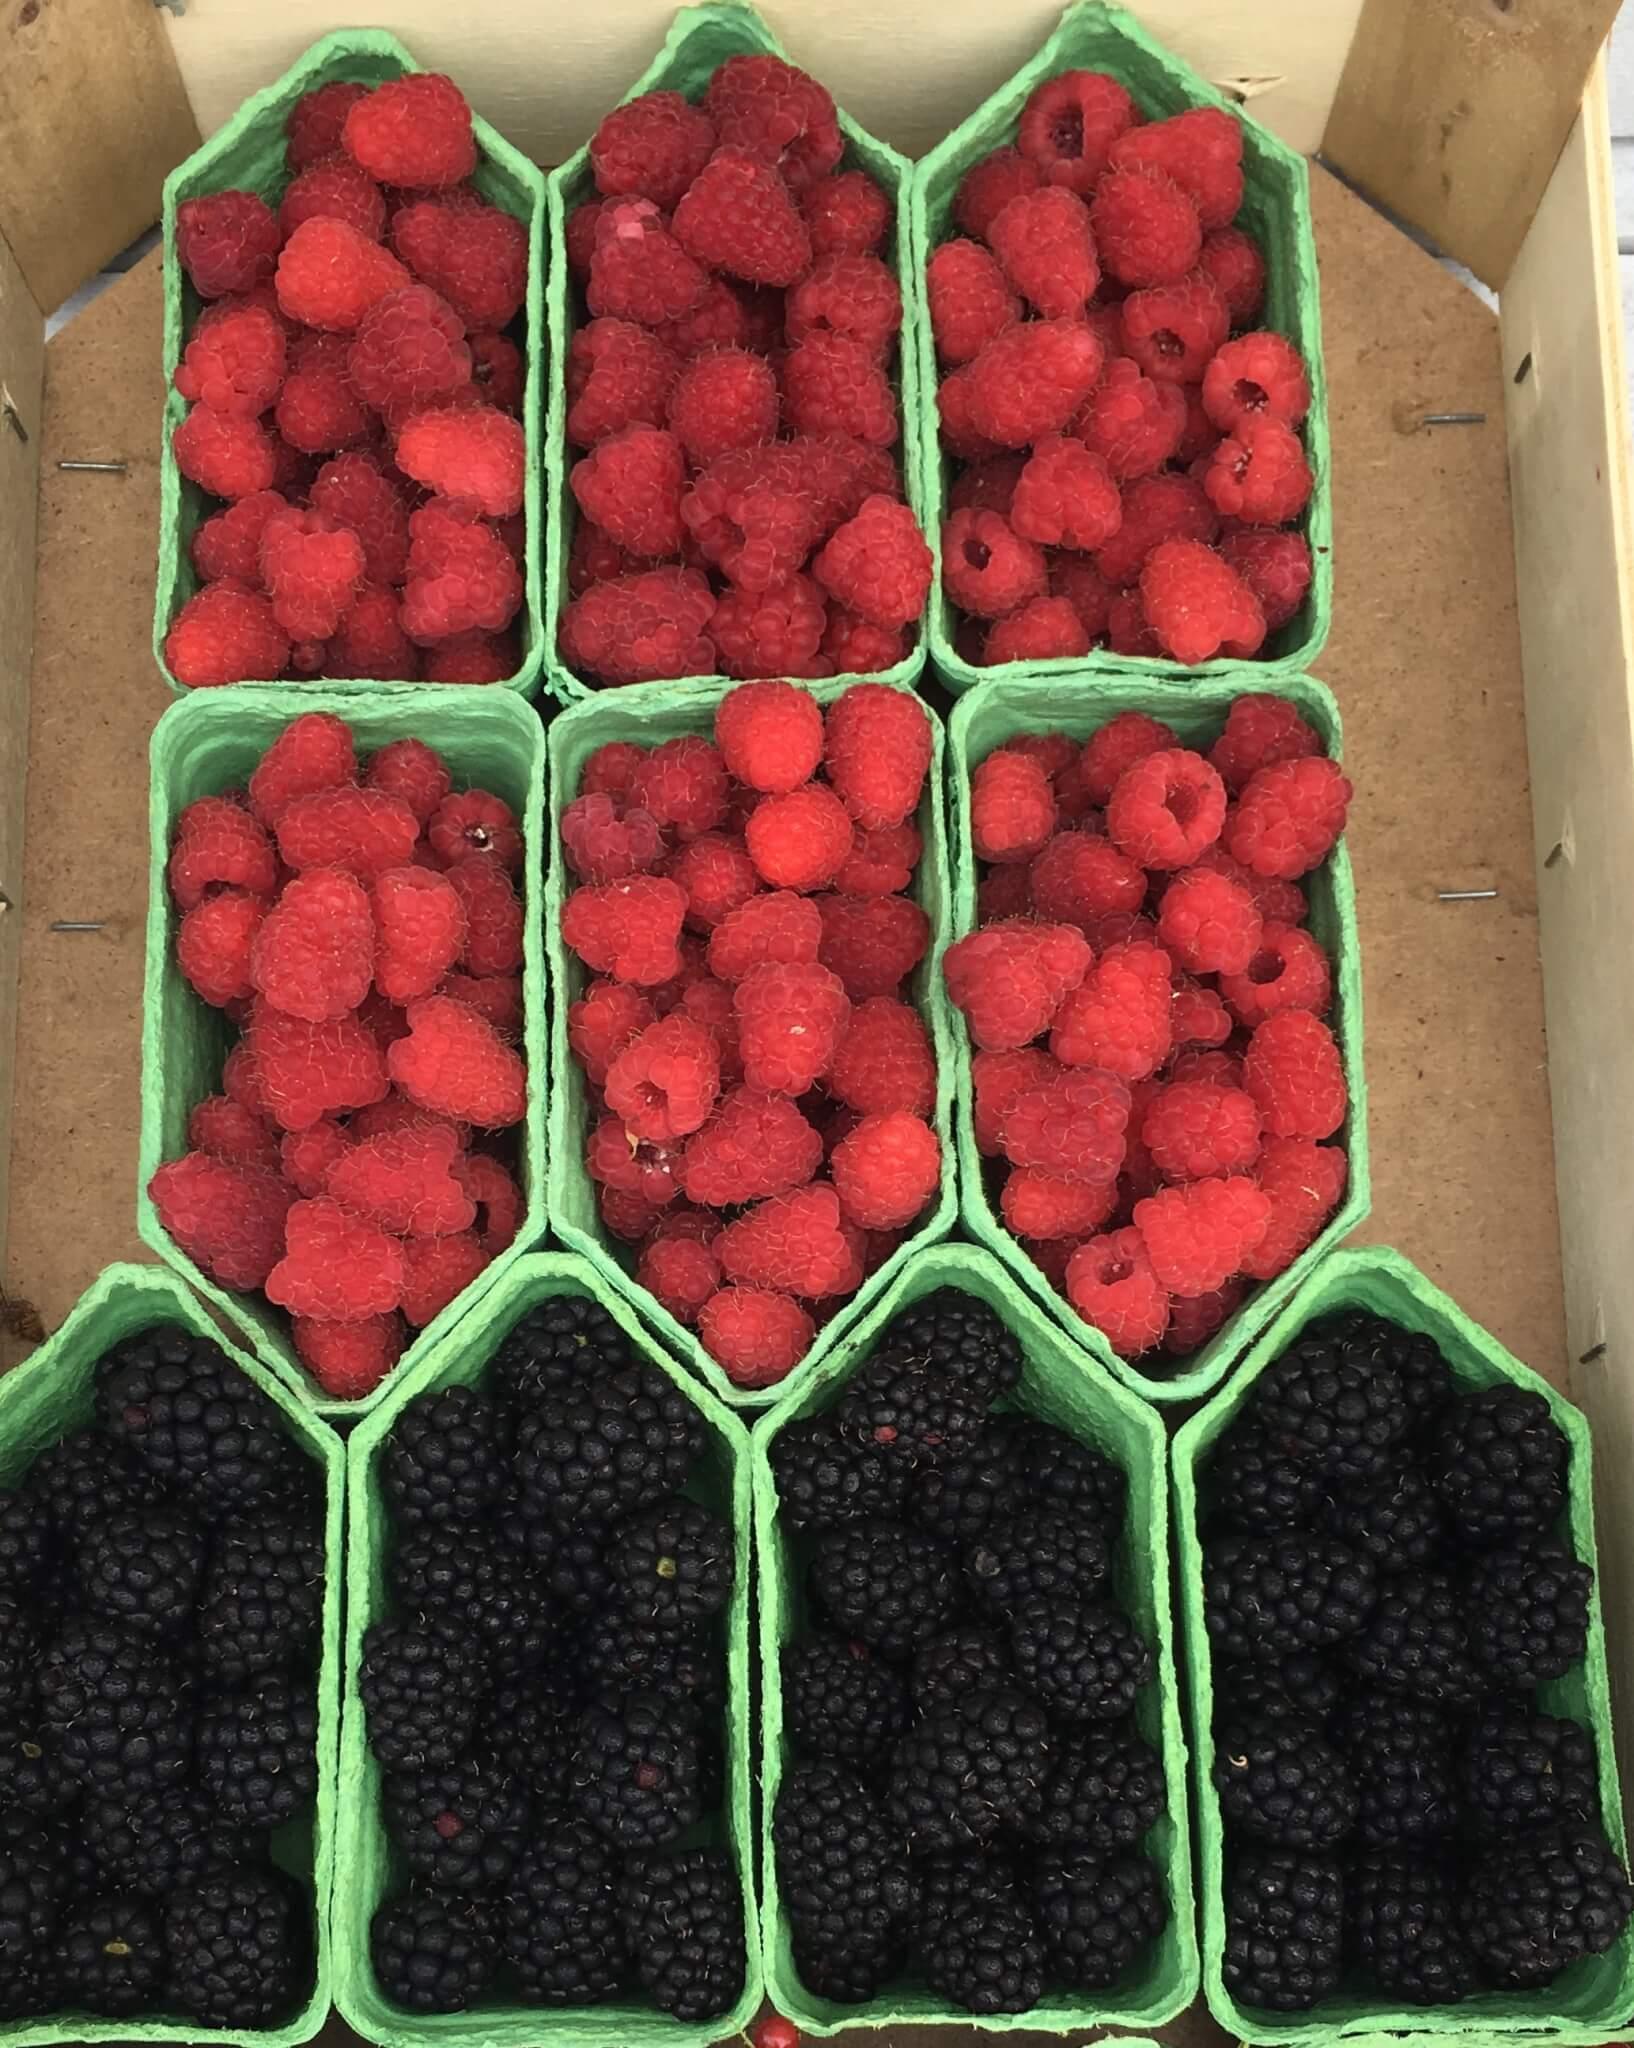 Fruitbedrijf Van den Berge frambozen bramen